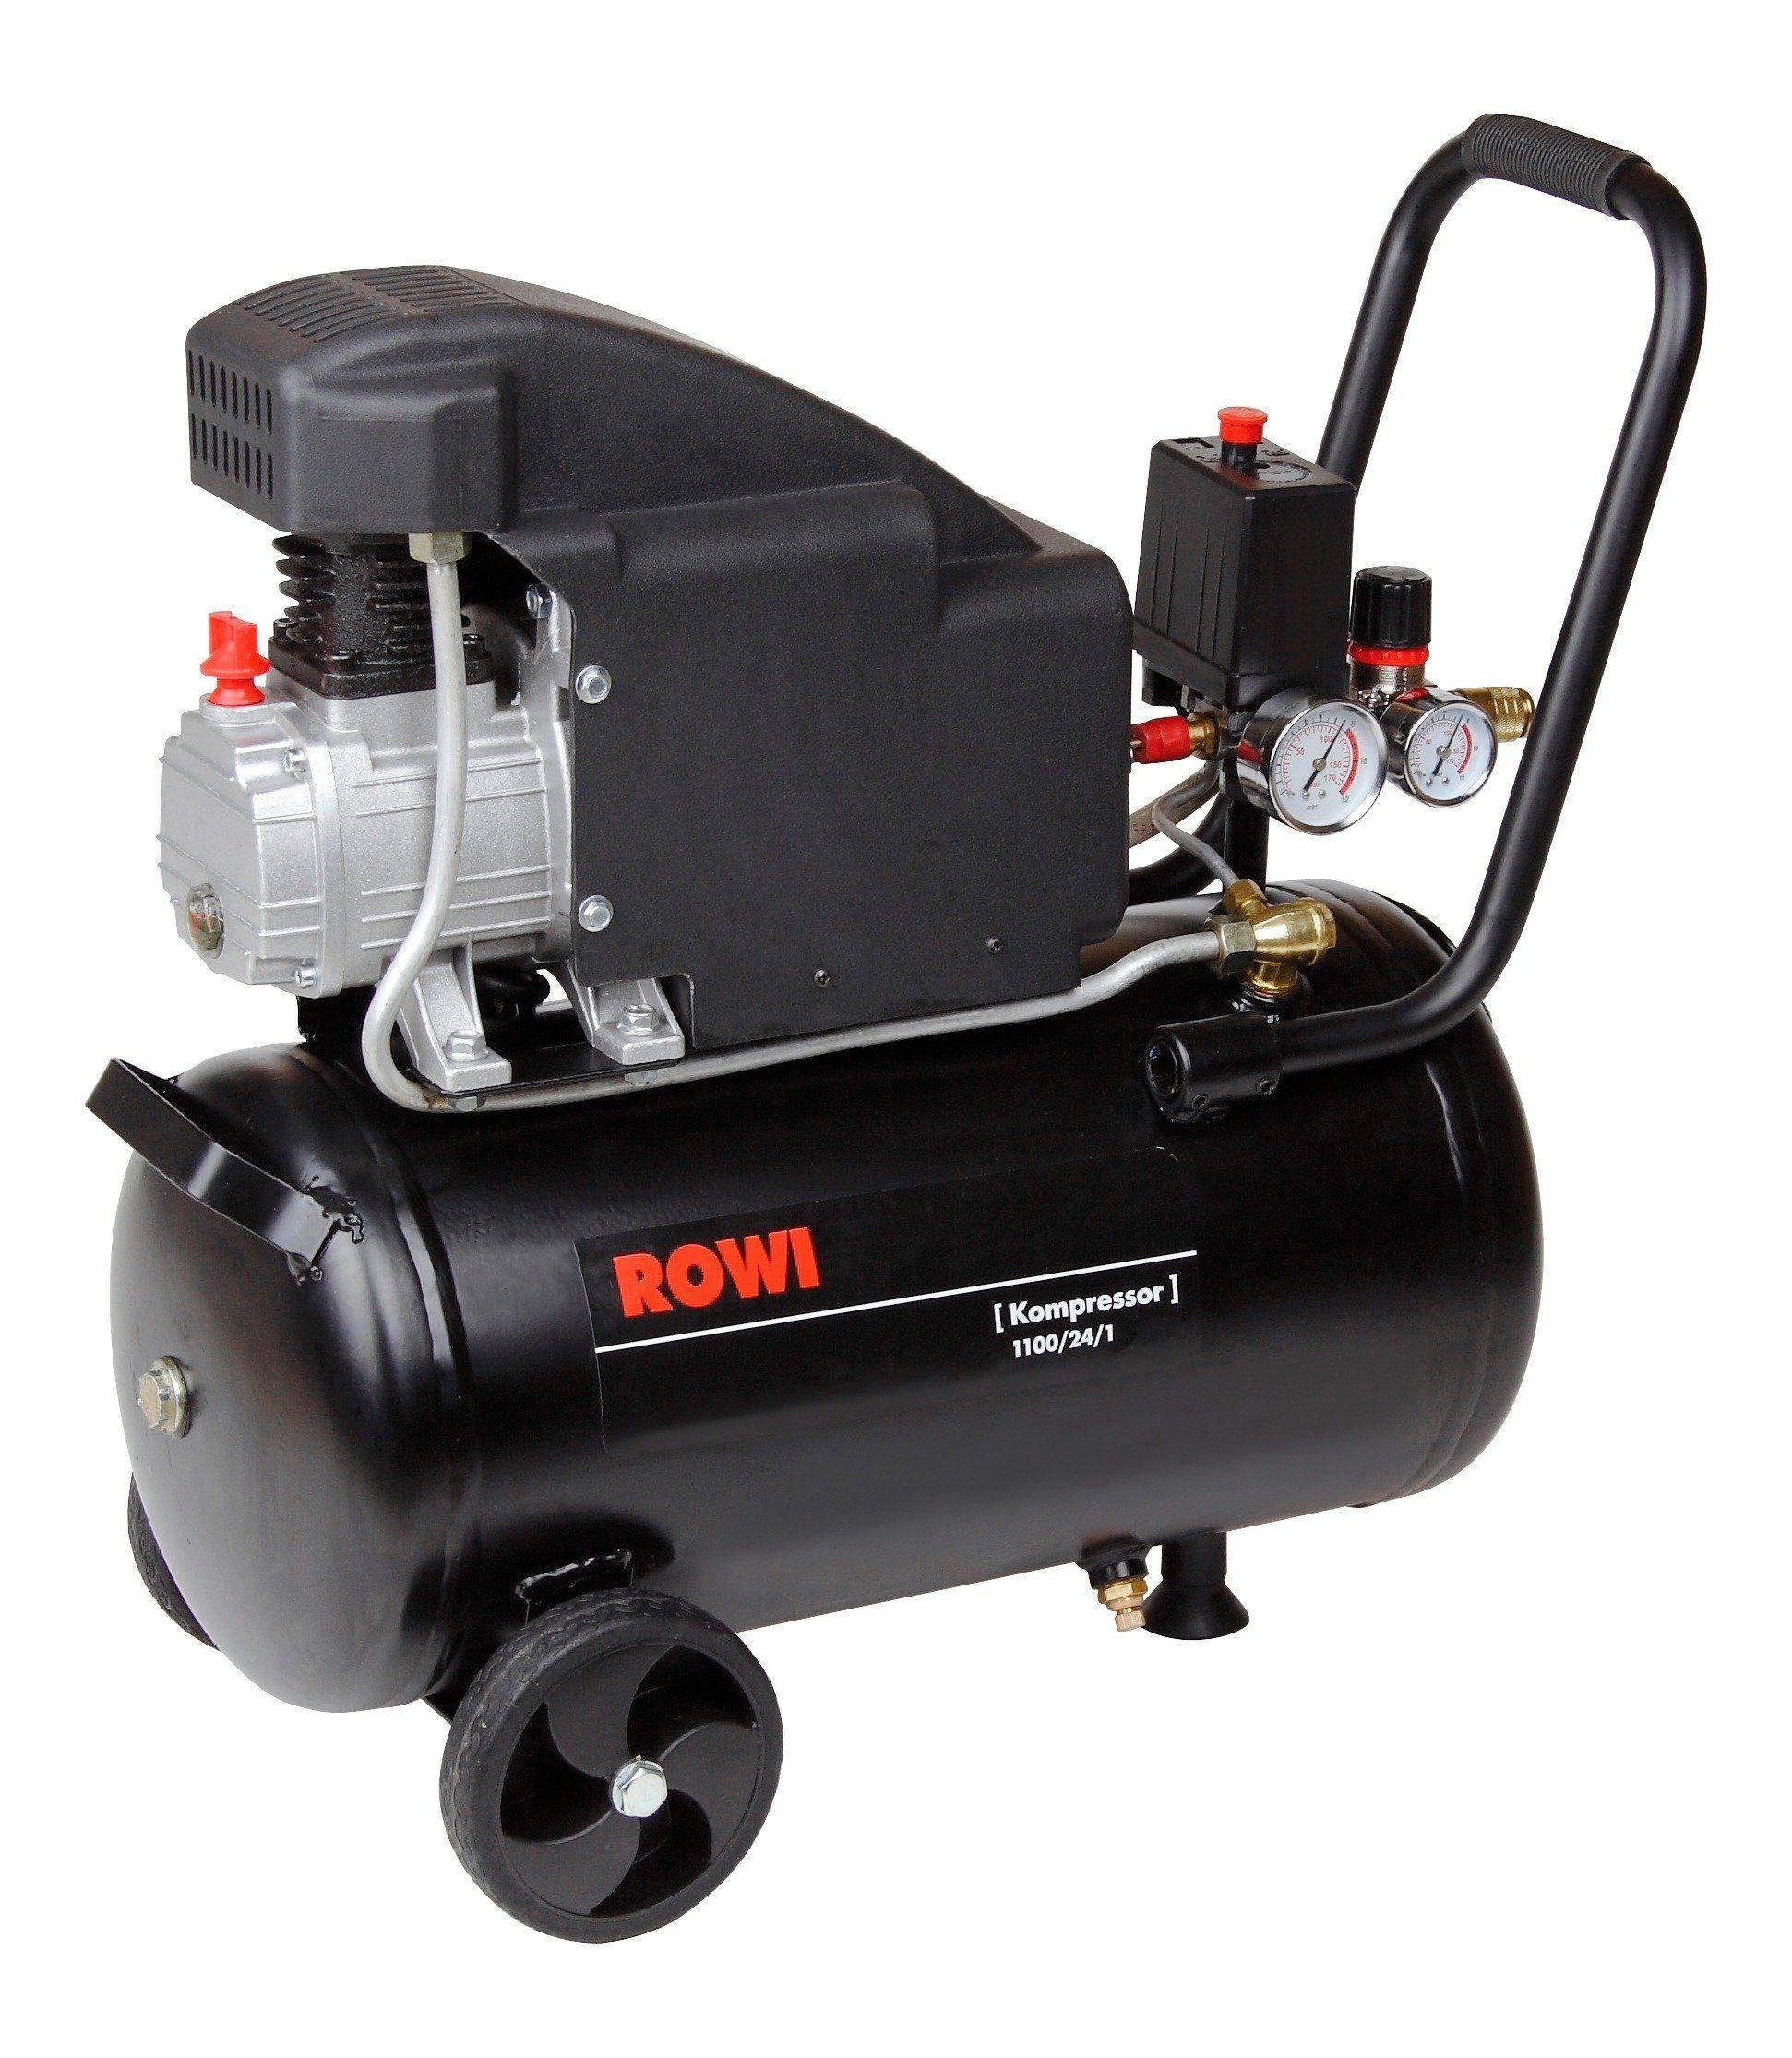 Rowi Kompressor »1500/24/1«